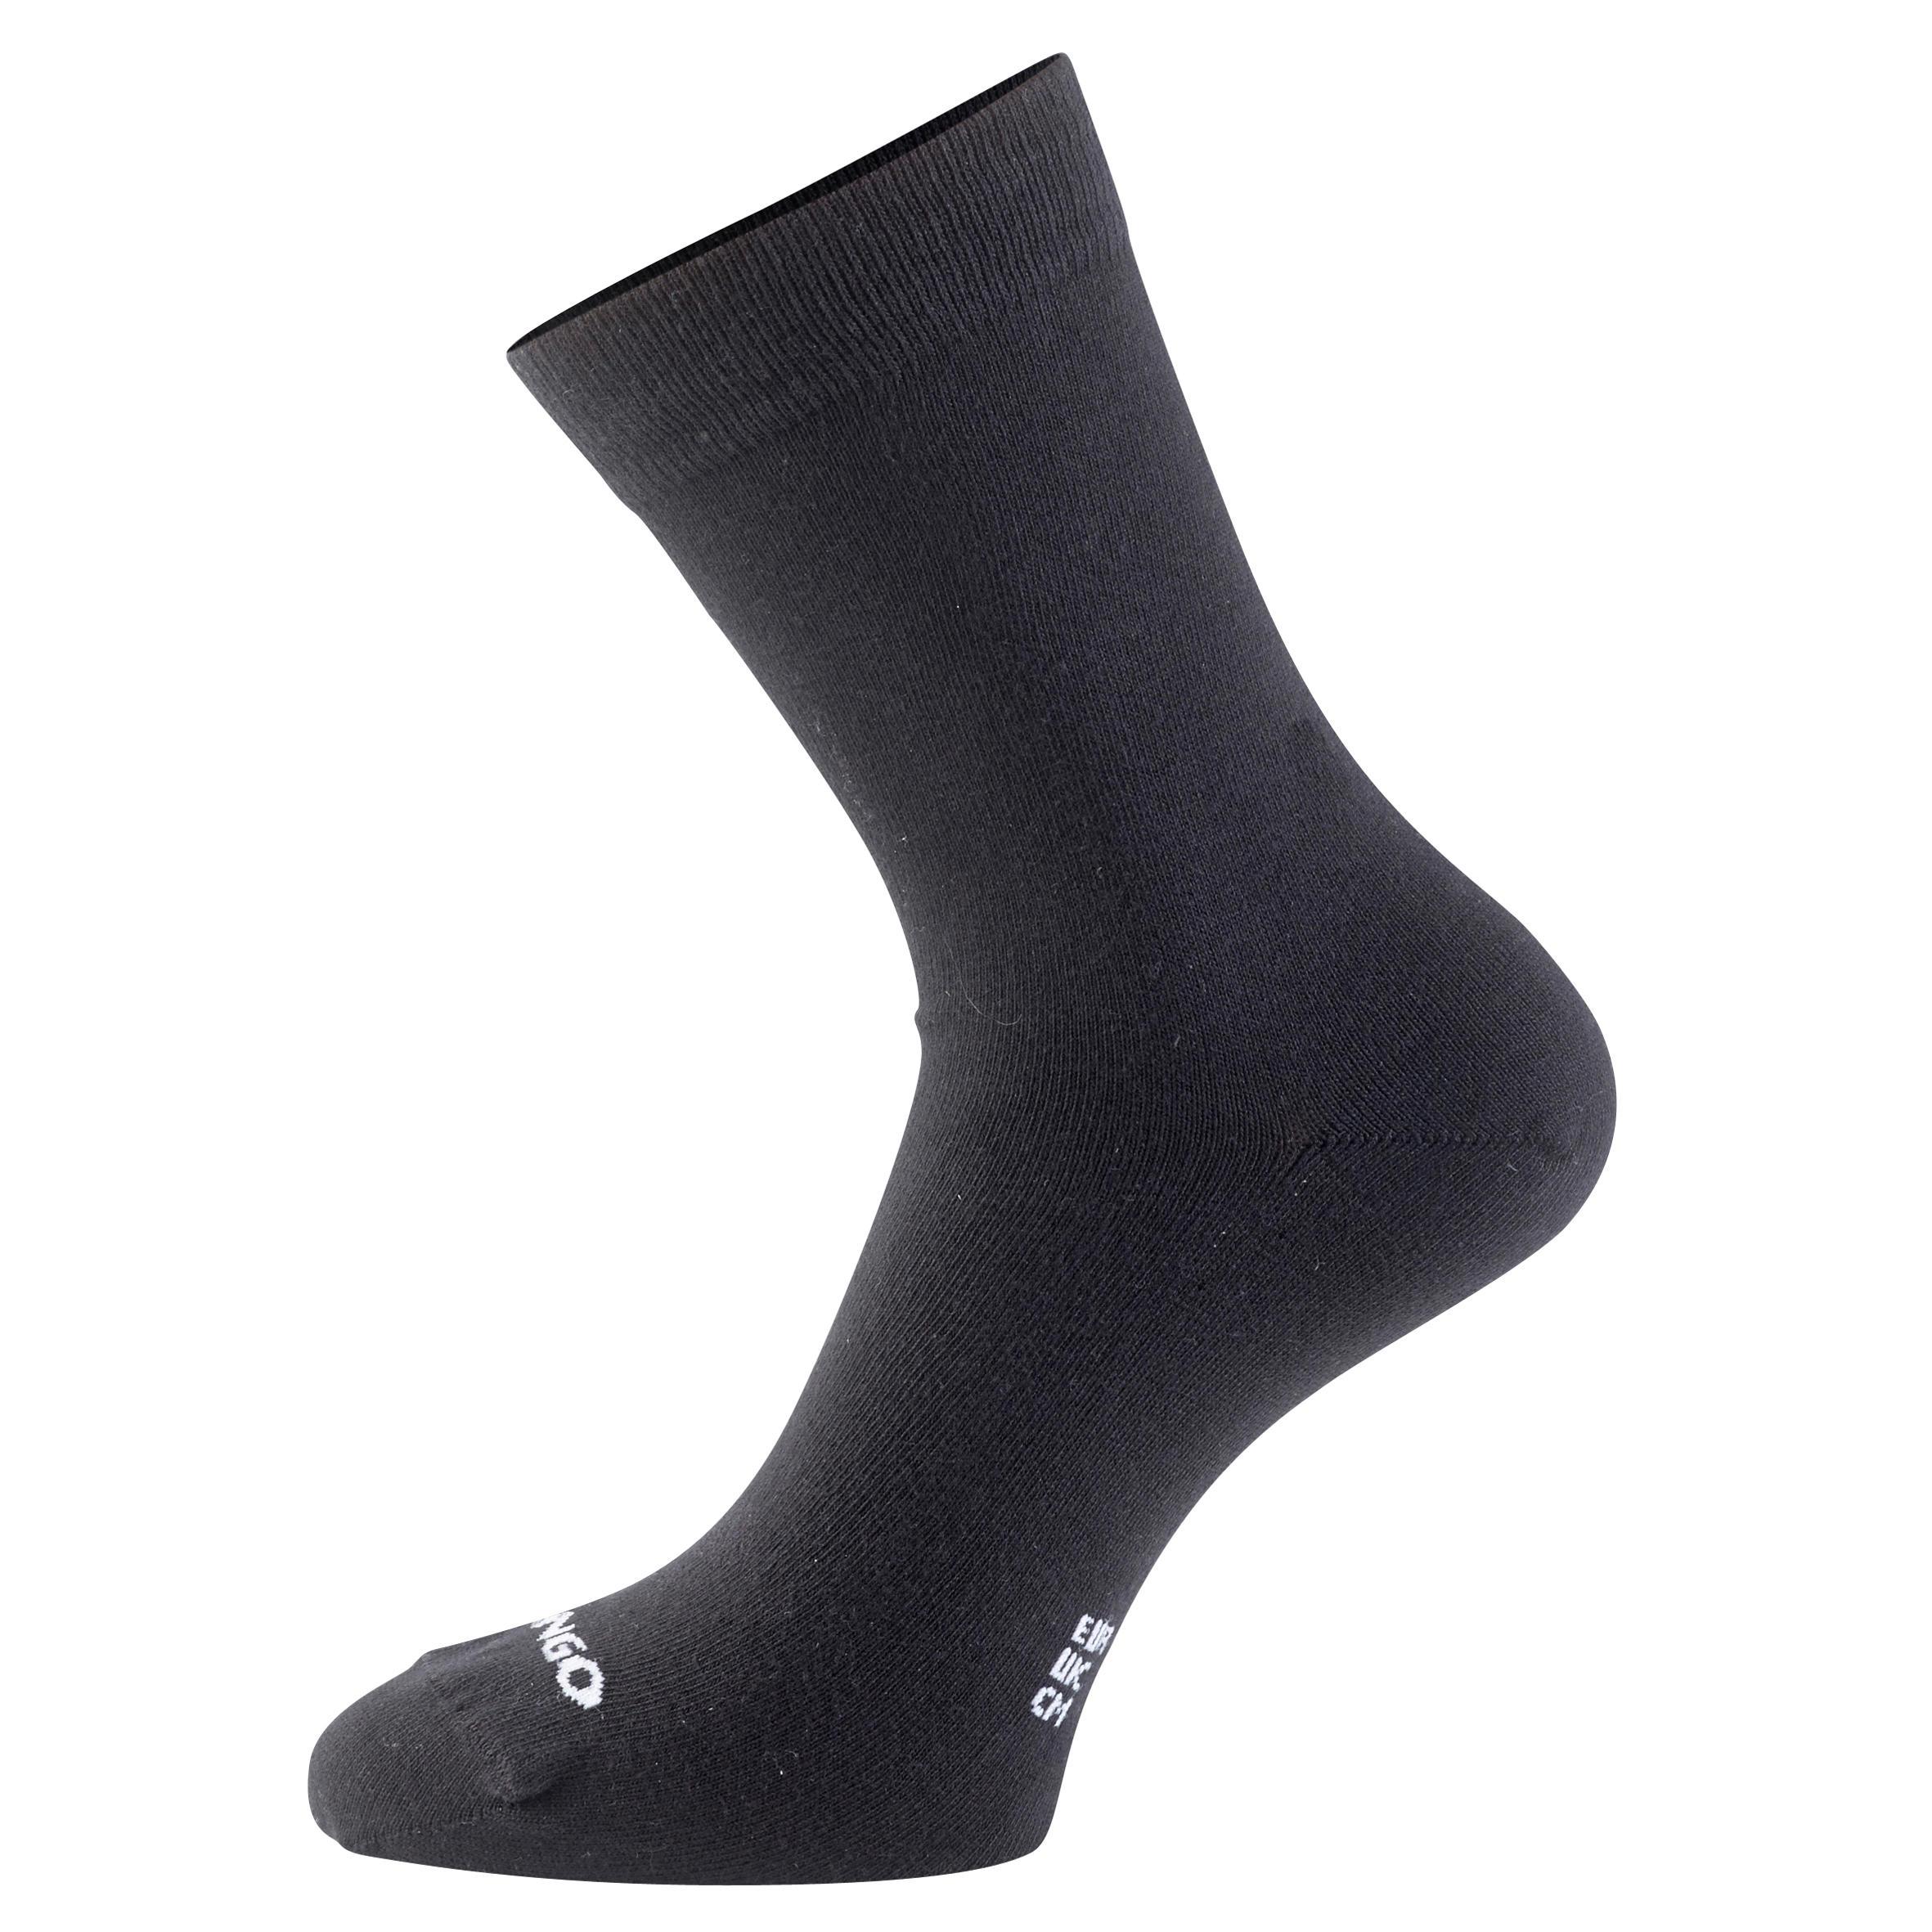 Socks high RS 160 - Black